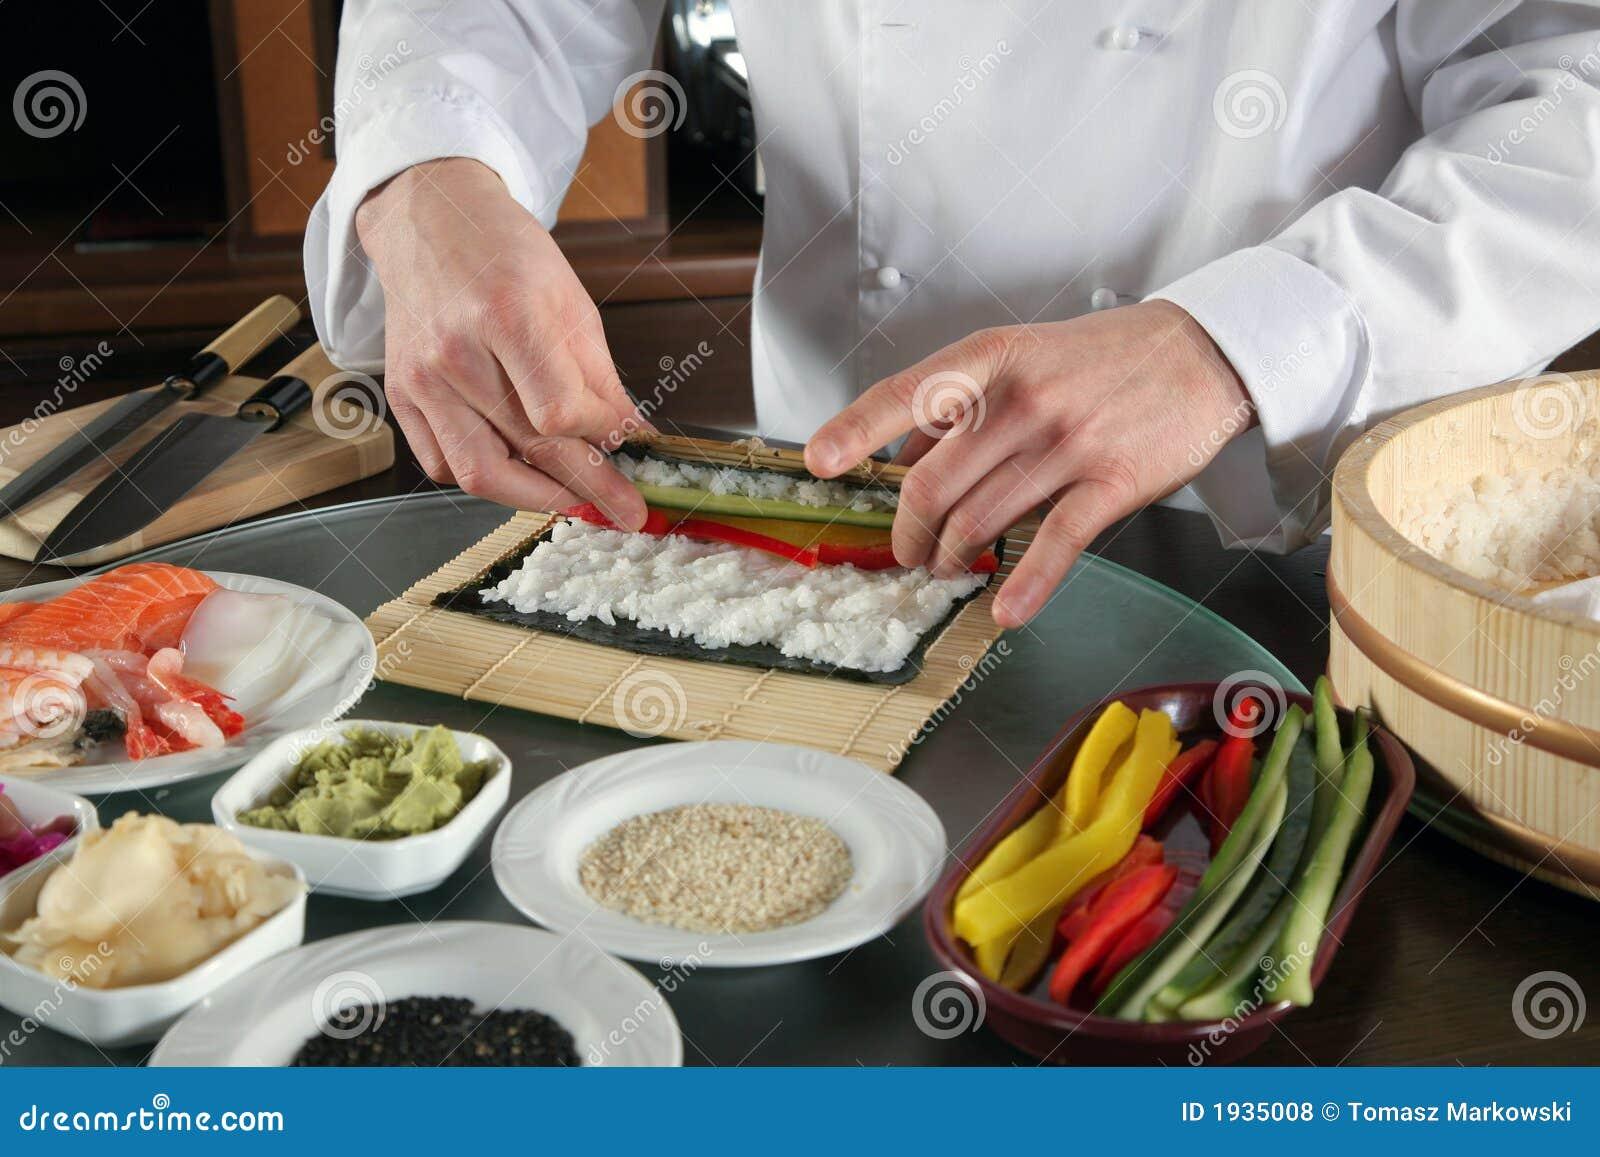 Chef Preparing Sushi 3 Royalty Free Stock Photos Image